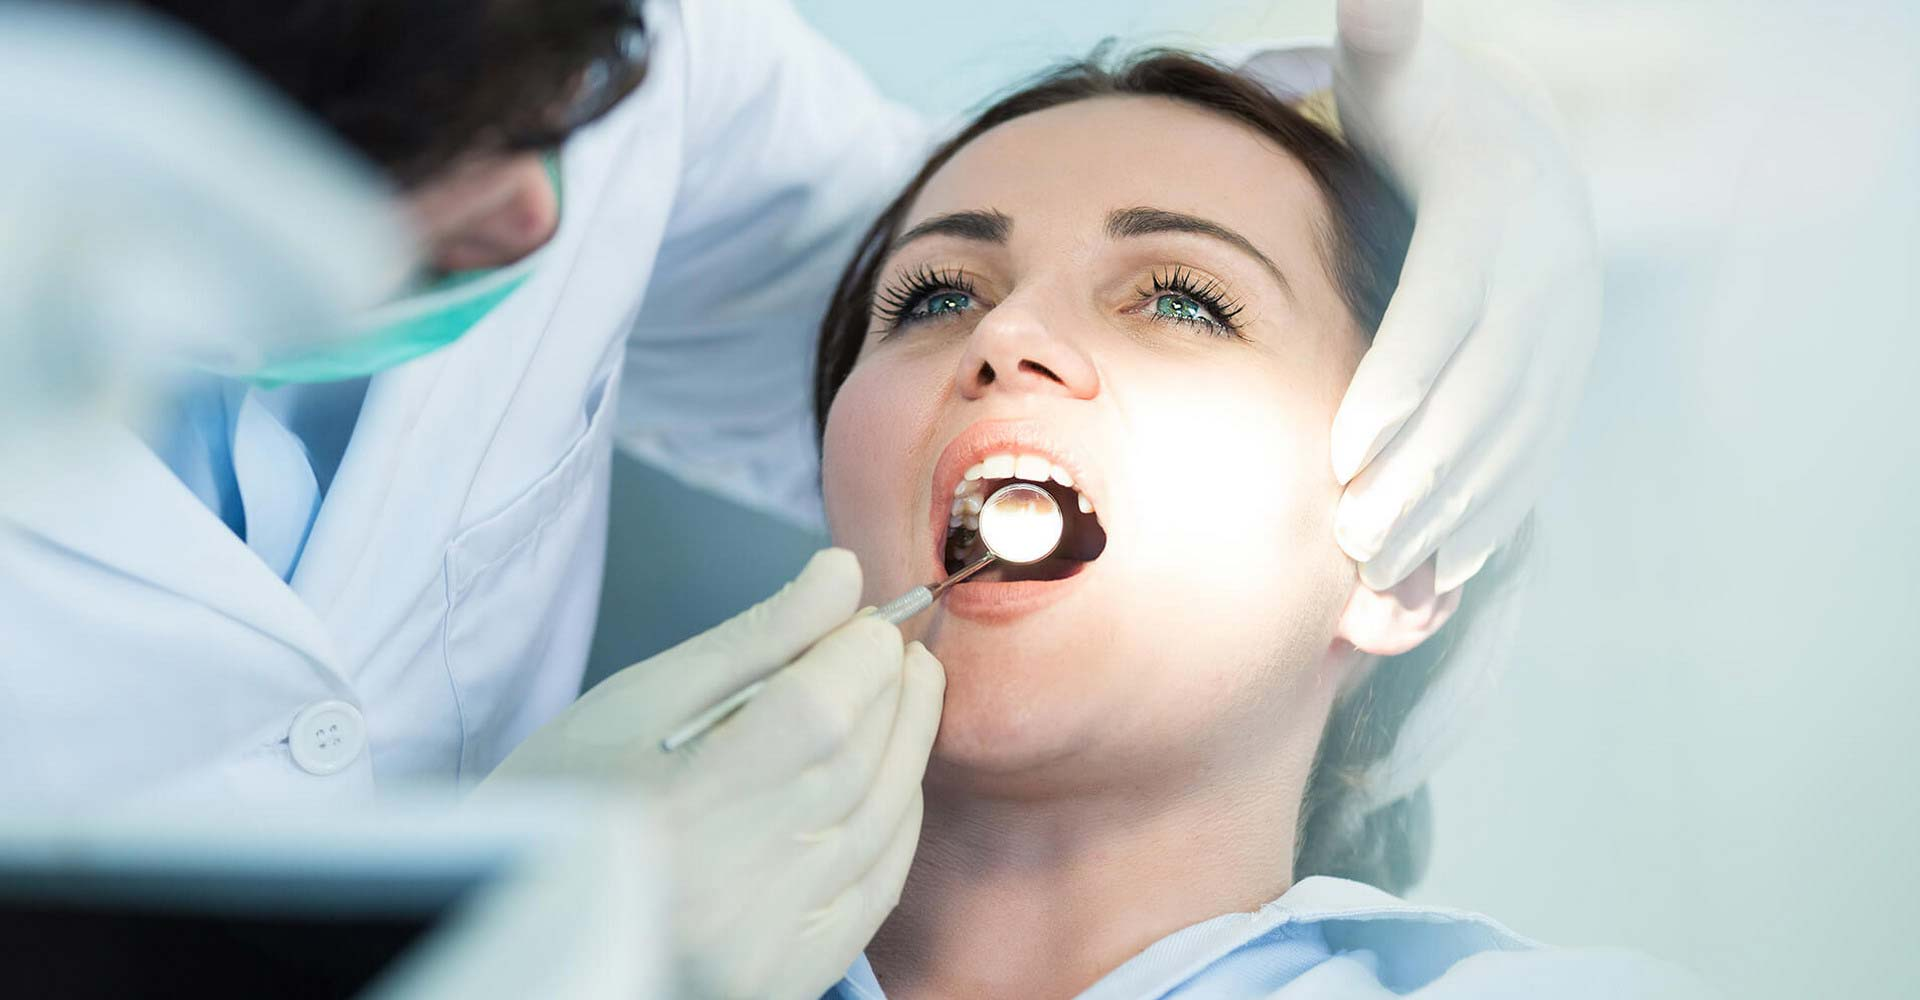 Odontoiatra Ferrara Dentista Ferrara Studio Odontoiatrico Dott. Nicola Mobilio Prestazioni - Visita Odontoiatrica